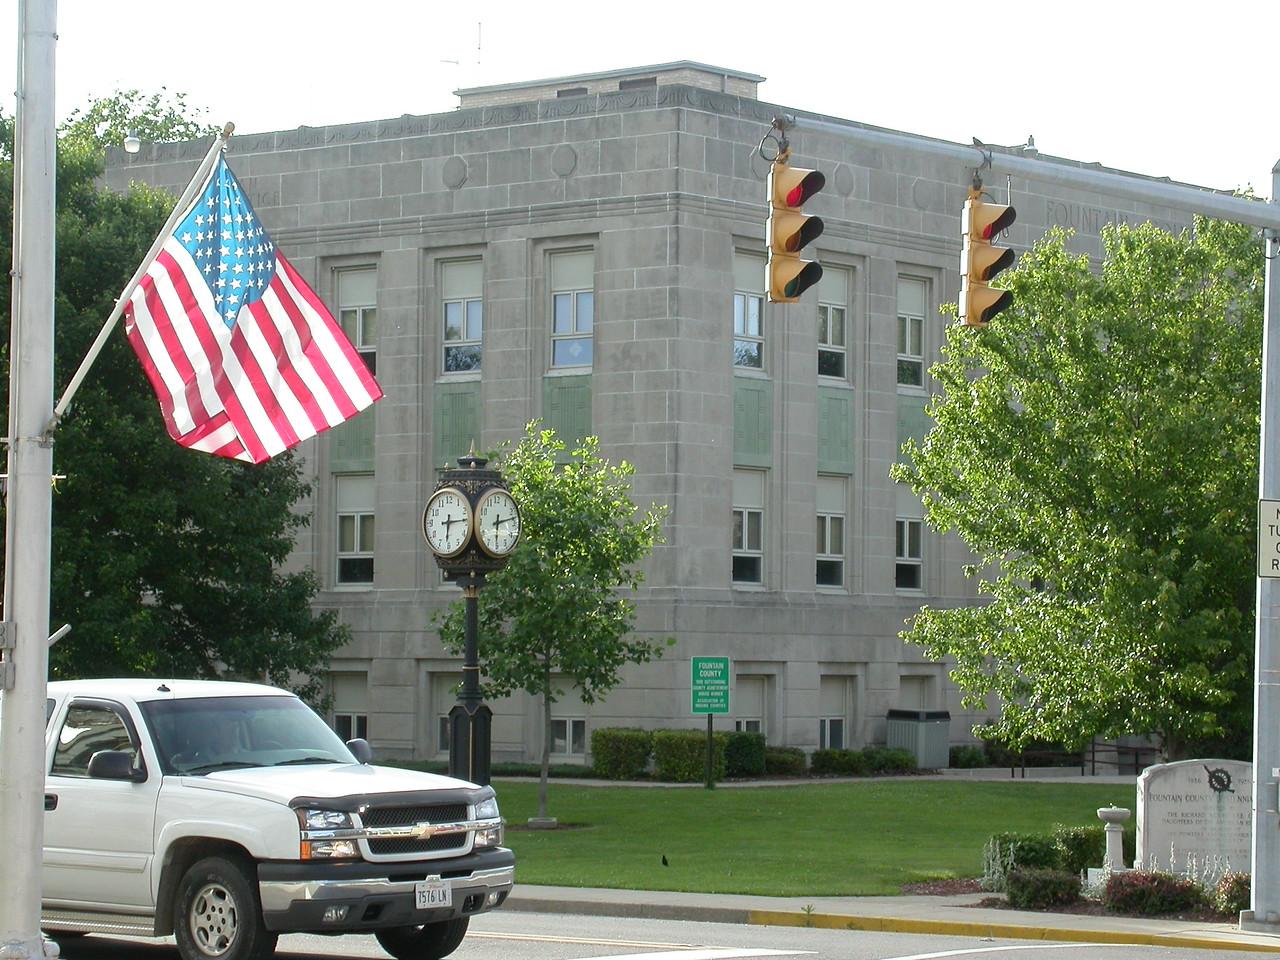 Fountain County Courthouse, Covington, Indiana, May 2004.